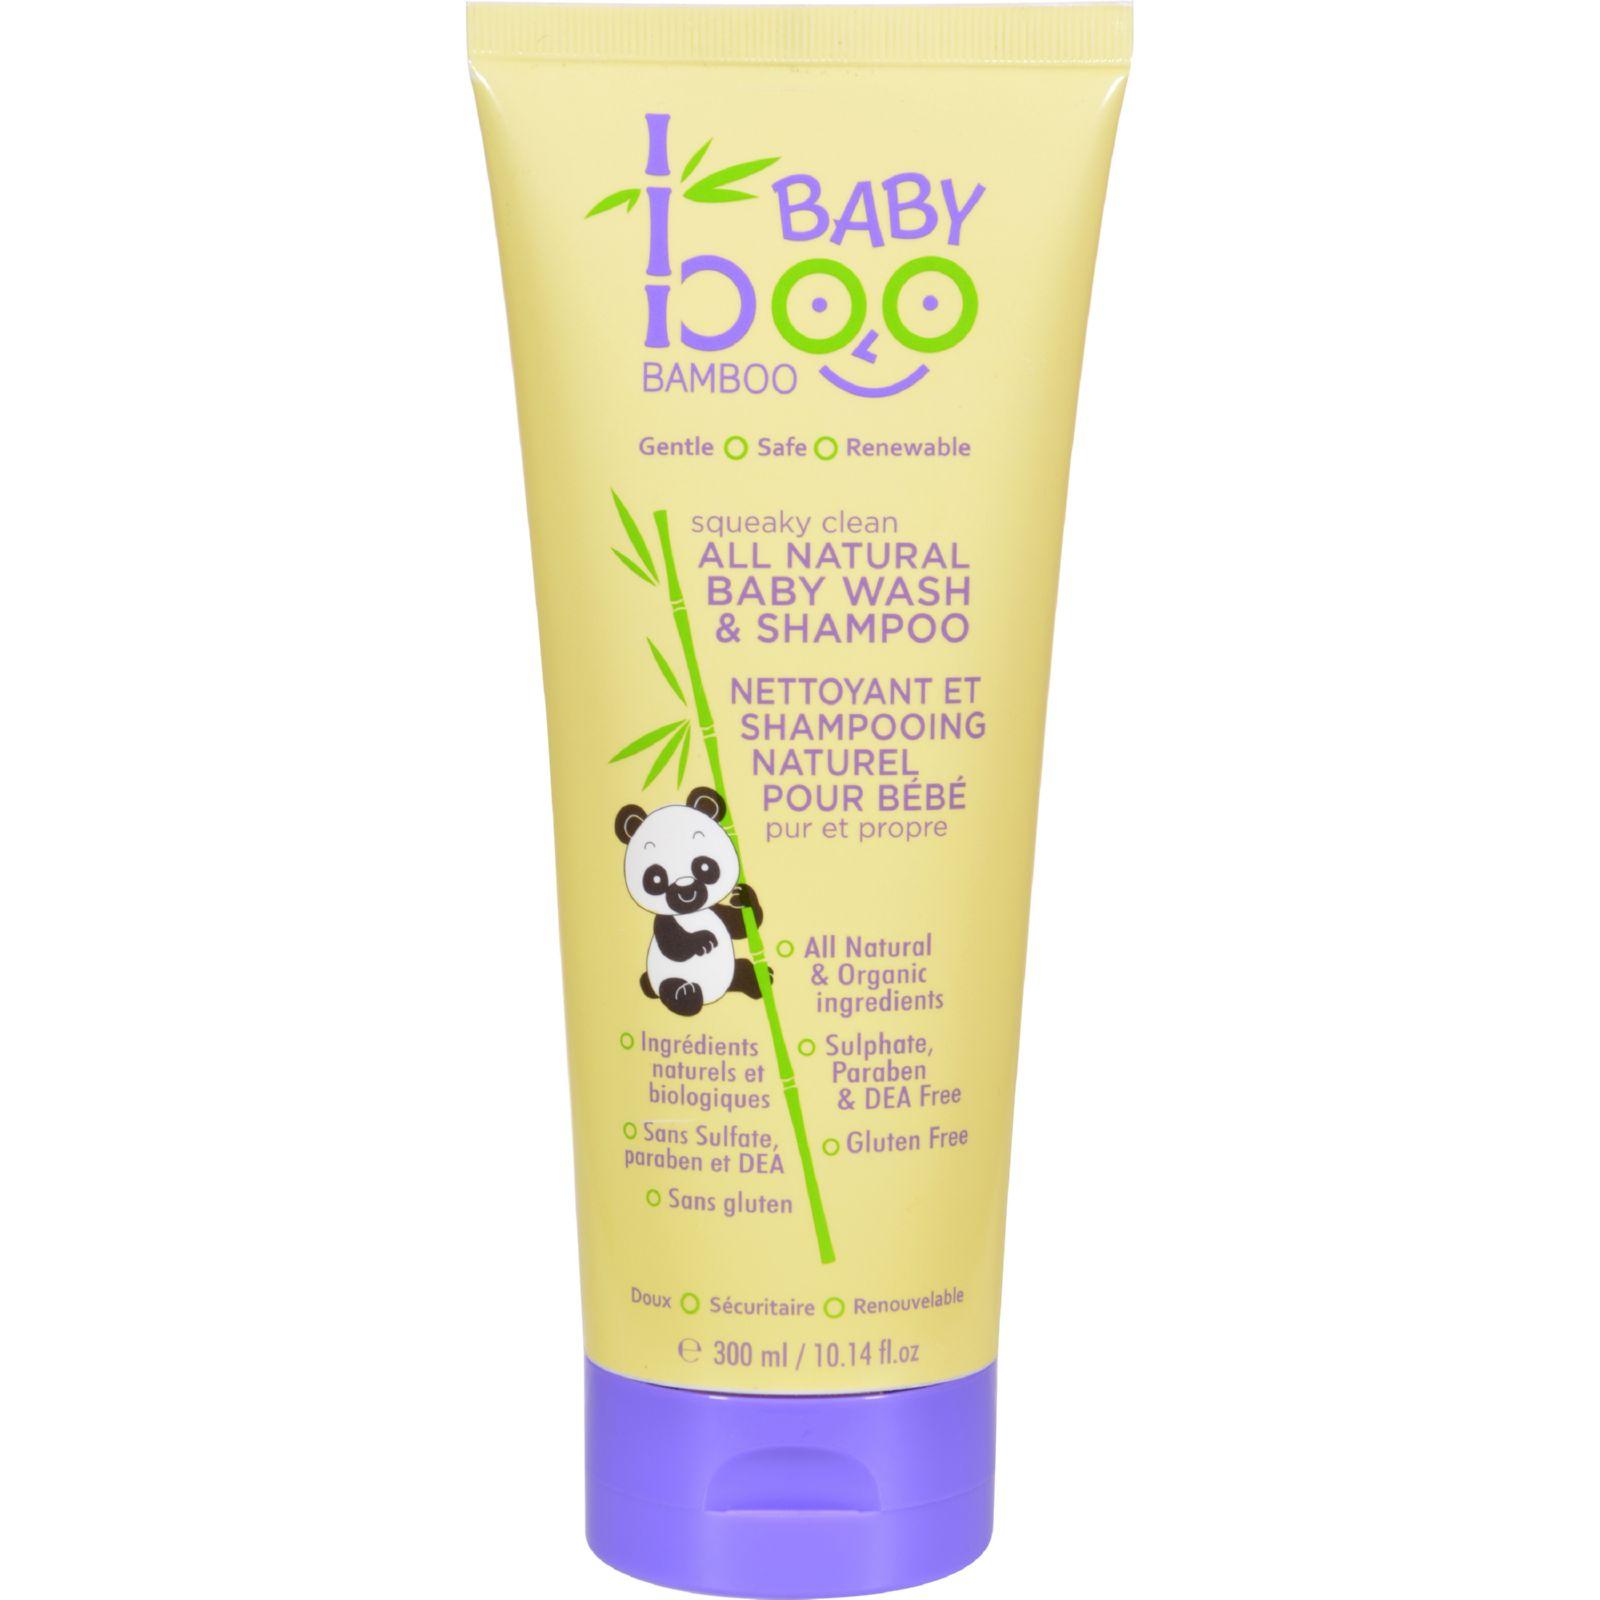 Boo Bamboo Baby Hair and Body Wash - 10.14 oz